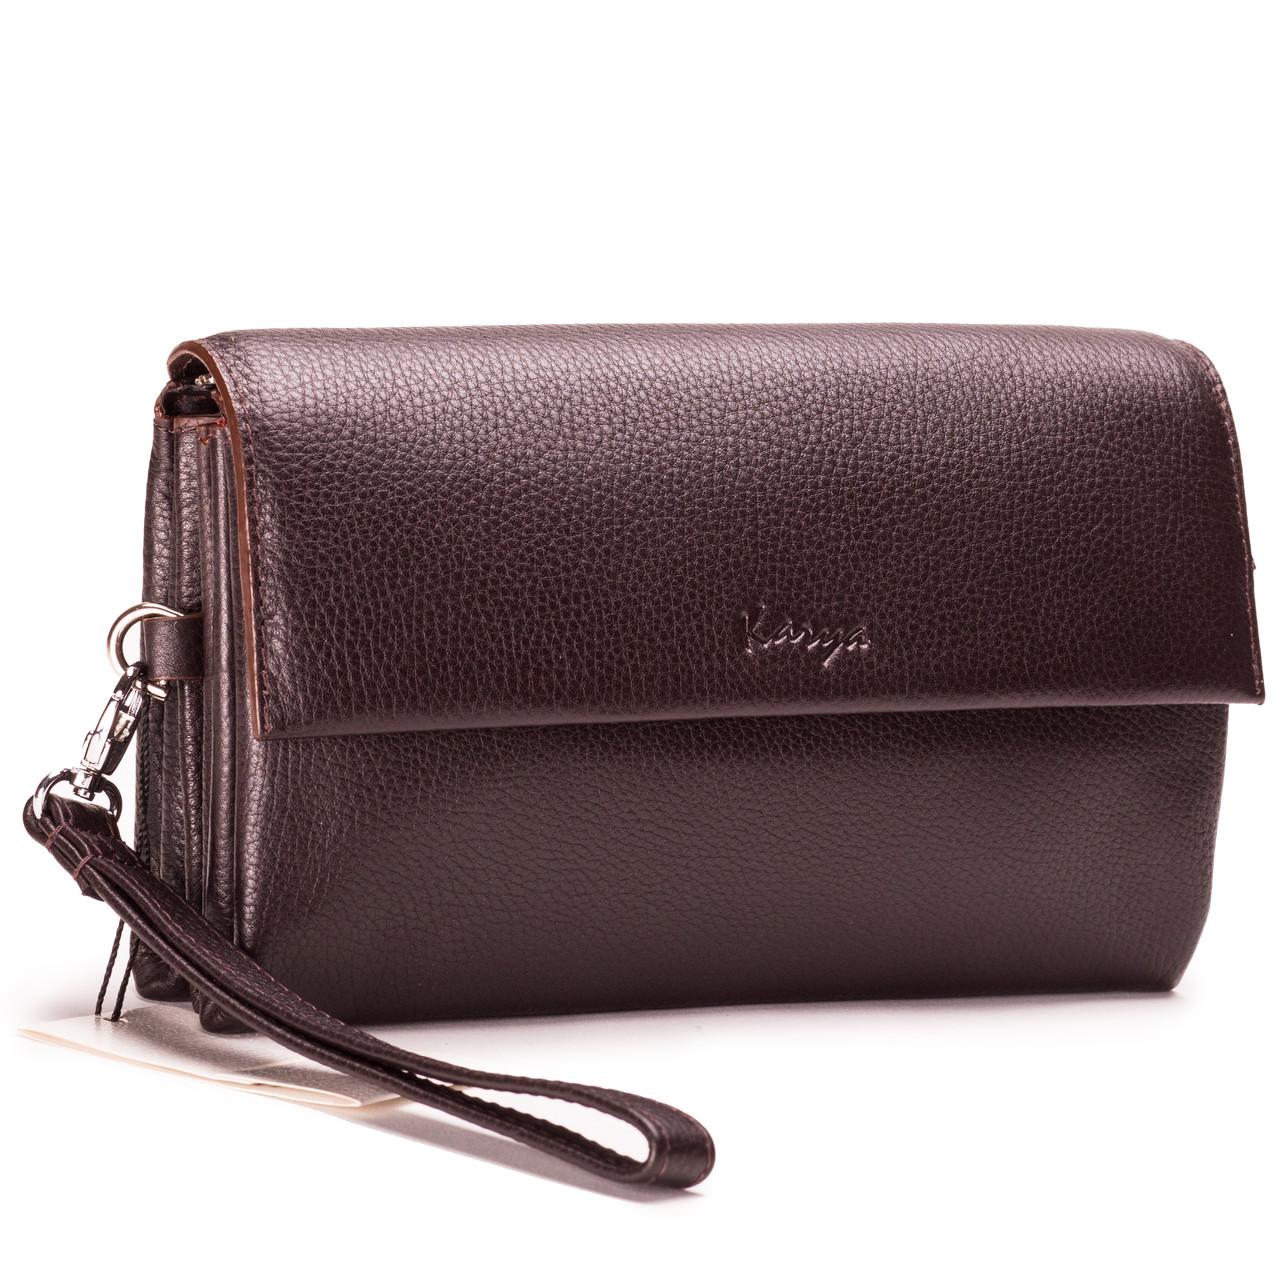 Мужская сумка барсетка кожаная коричневая Karya 0696-39